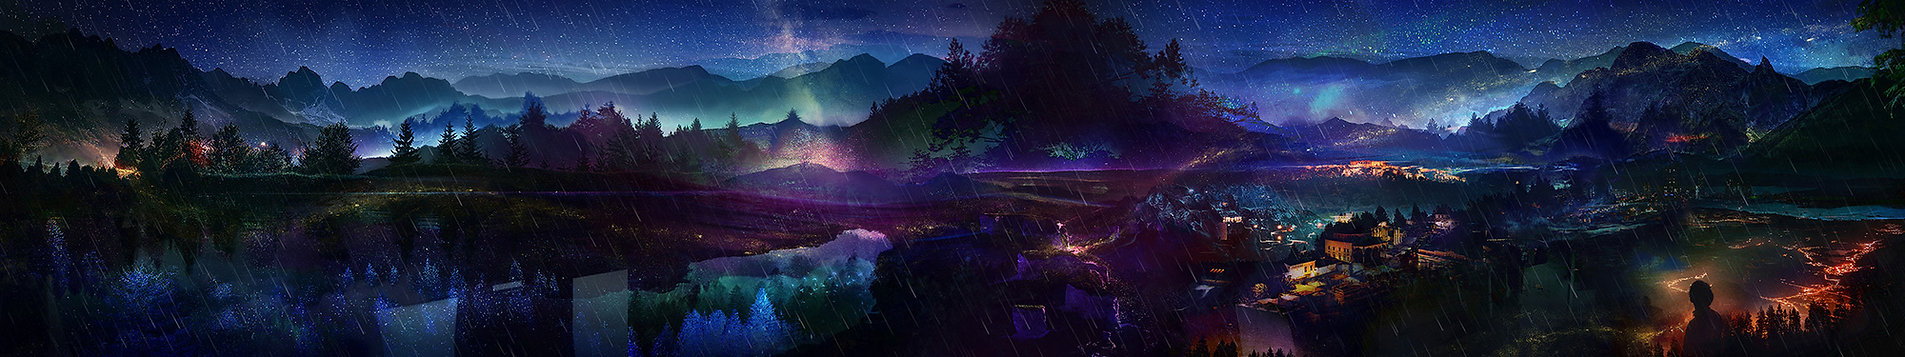 003(rain)2300.jpg